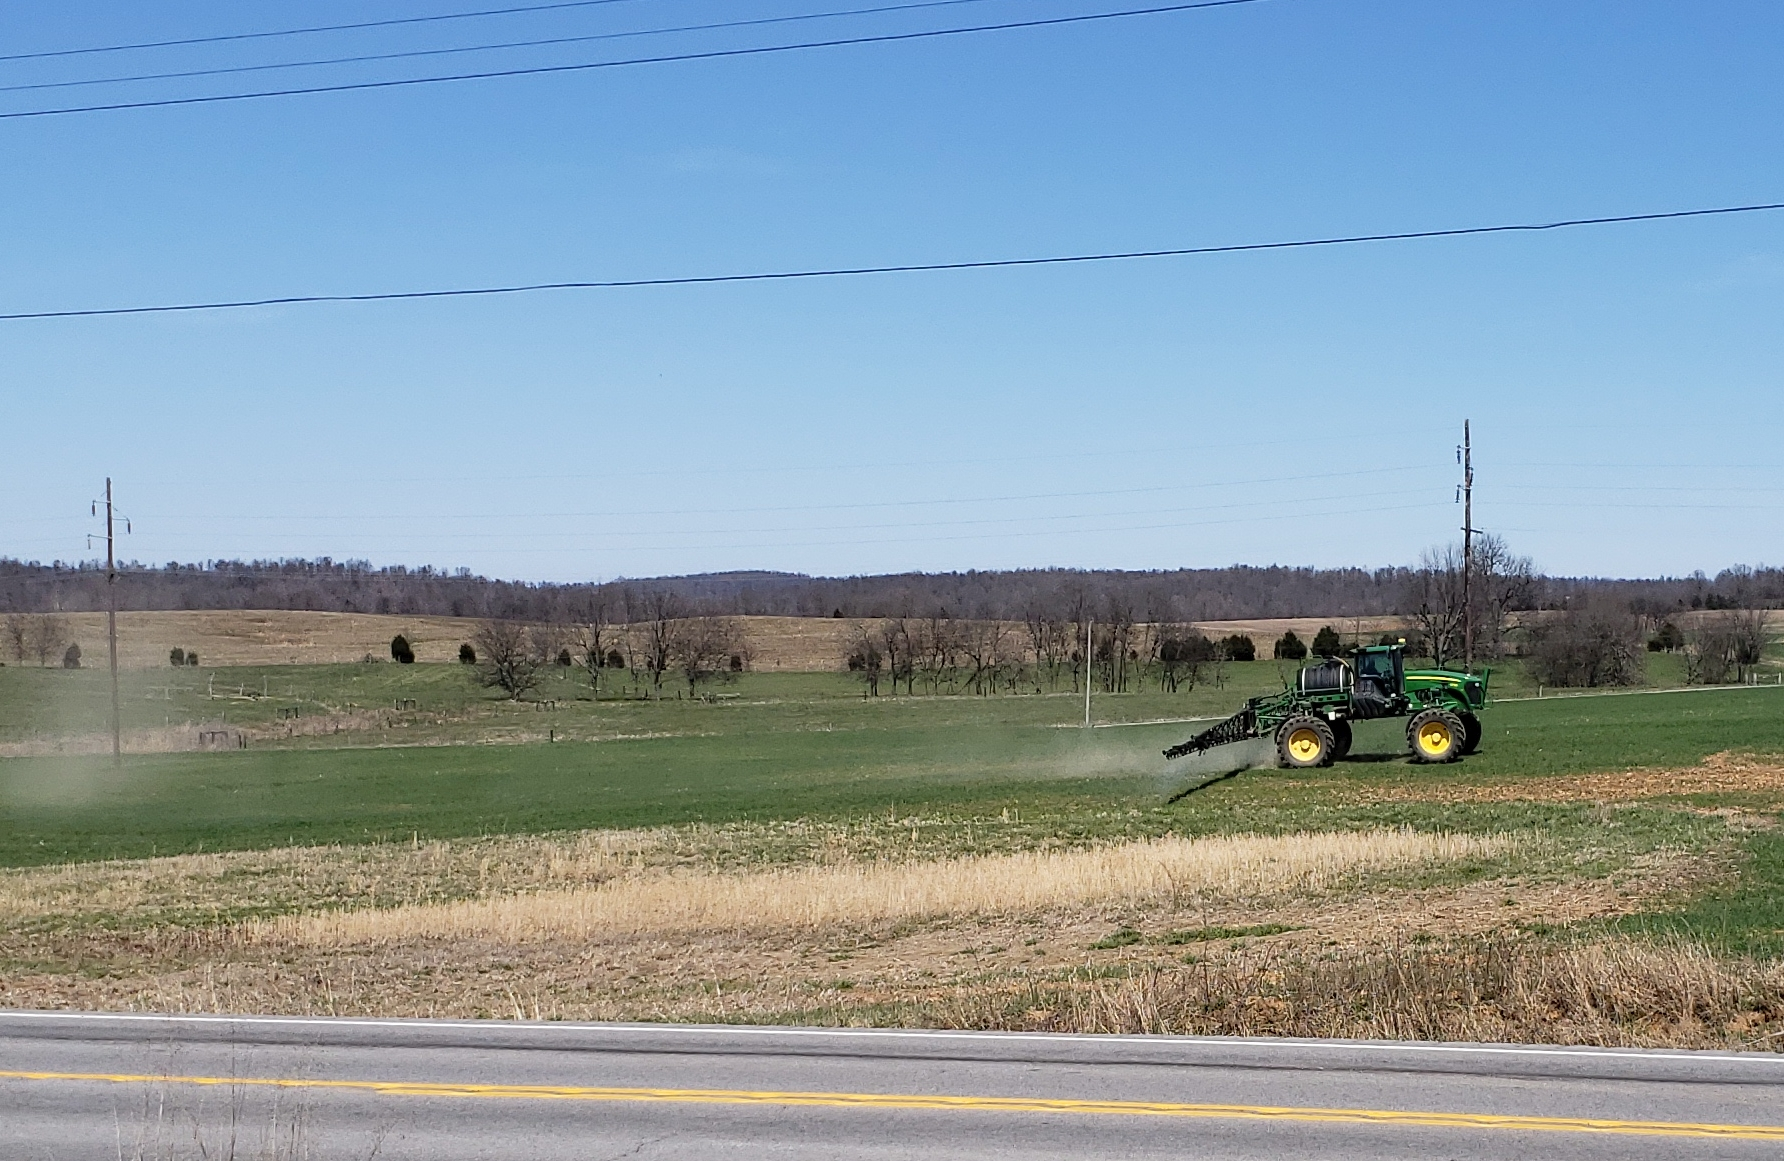 Figure 1. Farmer applying pesticides on wheat in Caldwell County, KY (March 2019) (Photo: Raul Villanueva, UK).